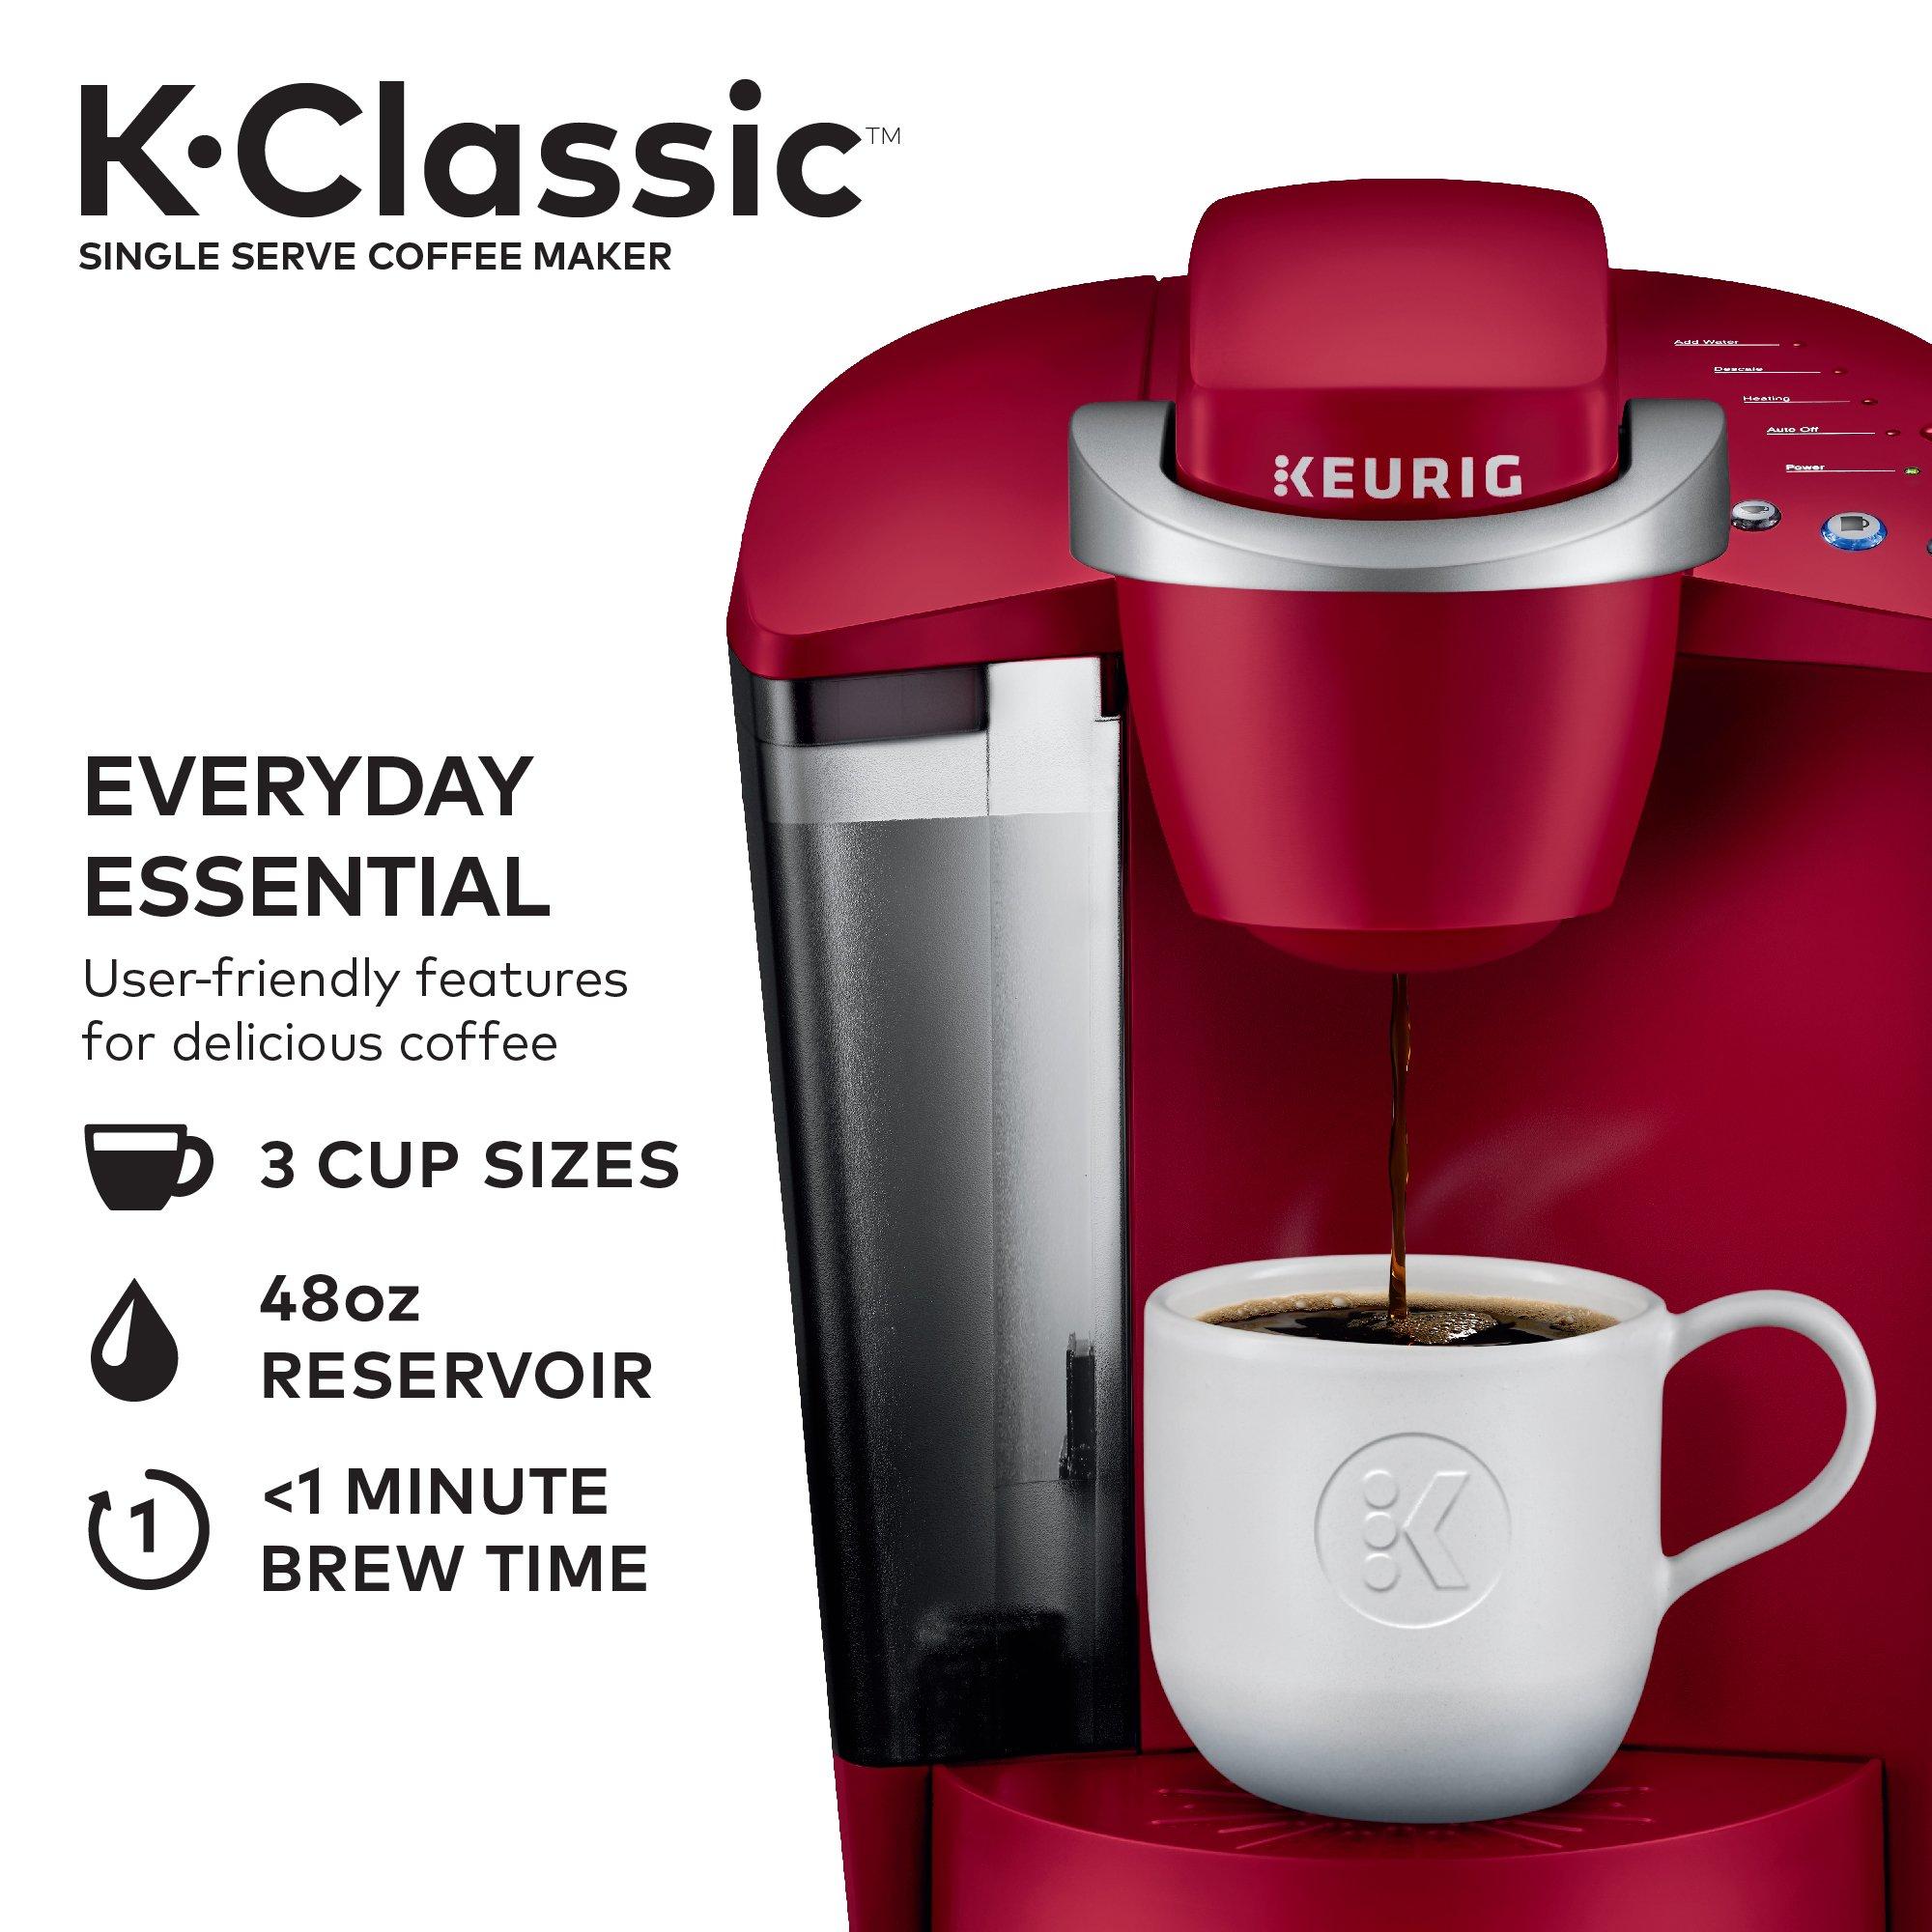 Keurig K-Classic Coffee Maker, Single Serve K-Cup Pod Coffee Brewer, 6 to 10 oz. Brew Sizes ...